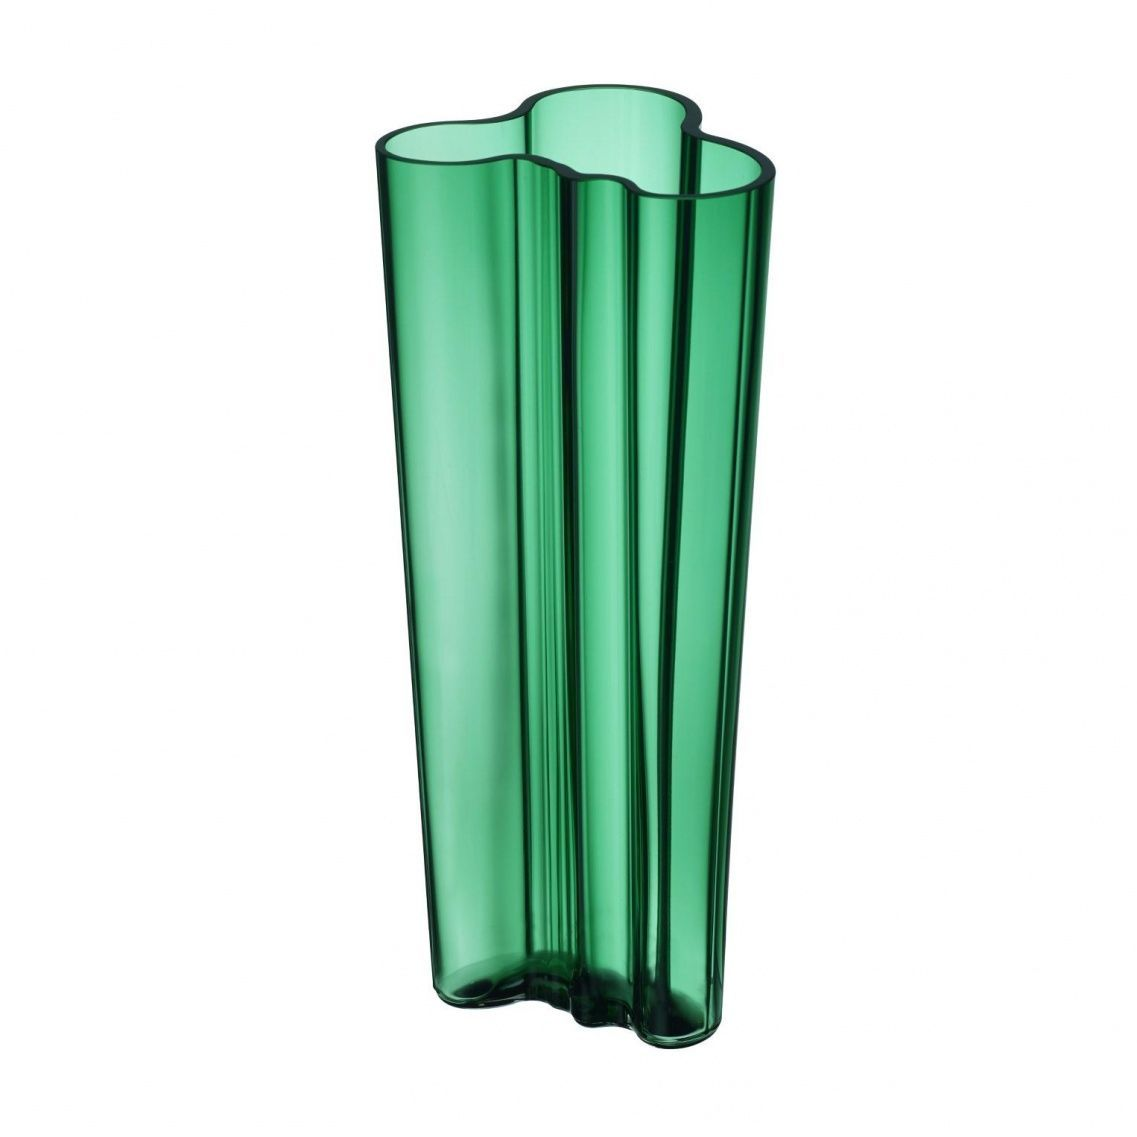 Iittala Alvar Aalto Vase 255mm Emerald Green Alvar